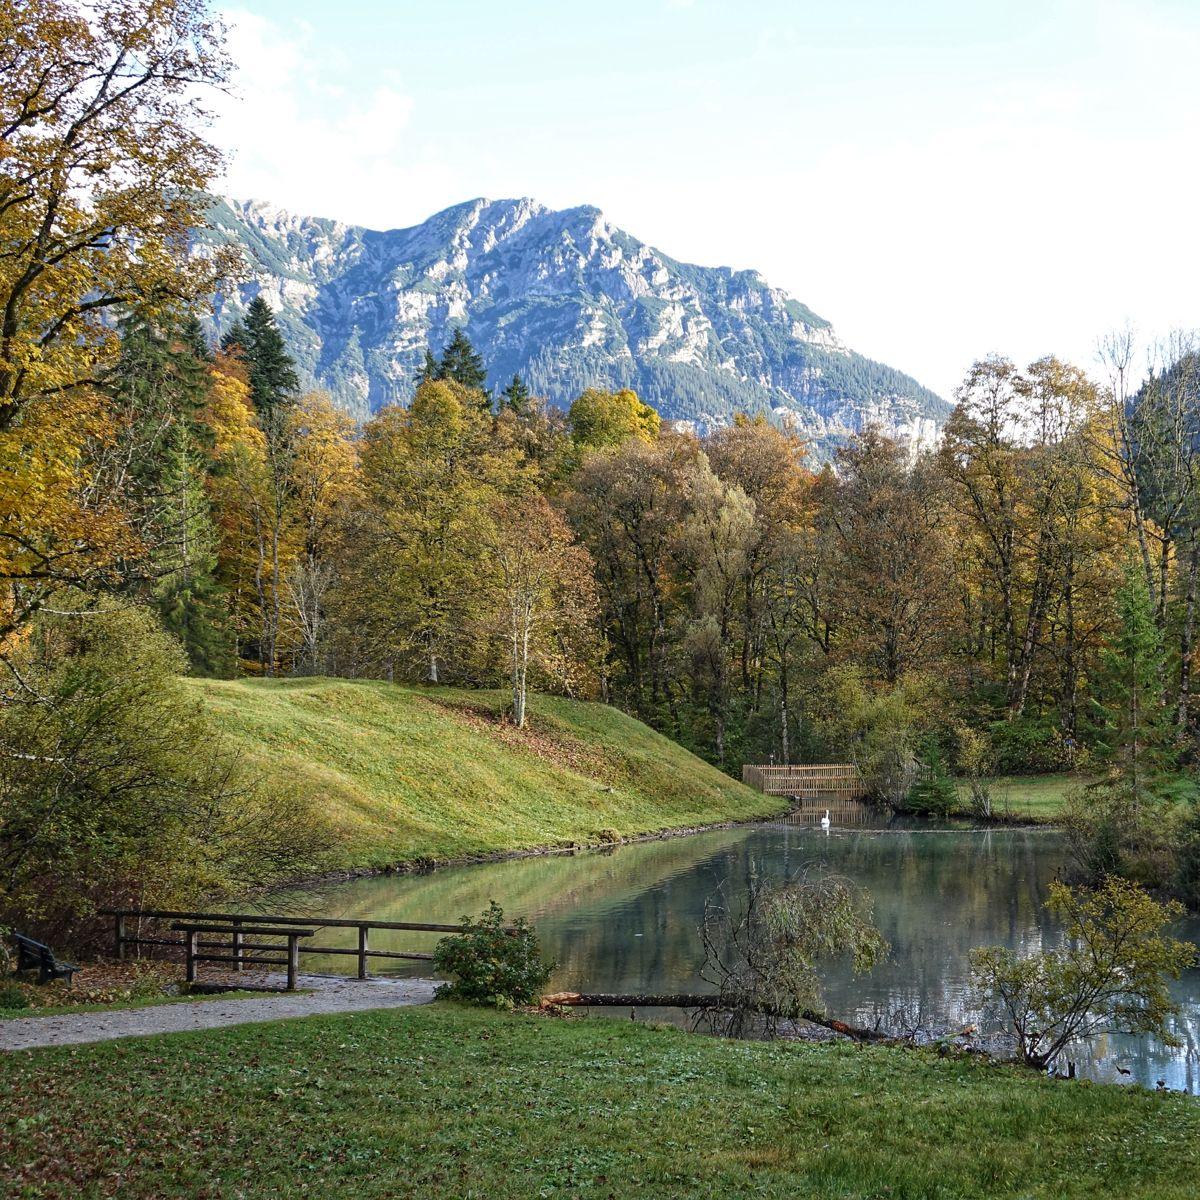 Konigsschlosser Deutschland Schloss Linderhof Schwanenweiher In 2020 Schloss Linderhof Konigsschlosser Linderhof